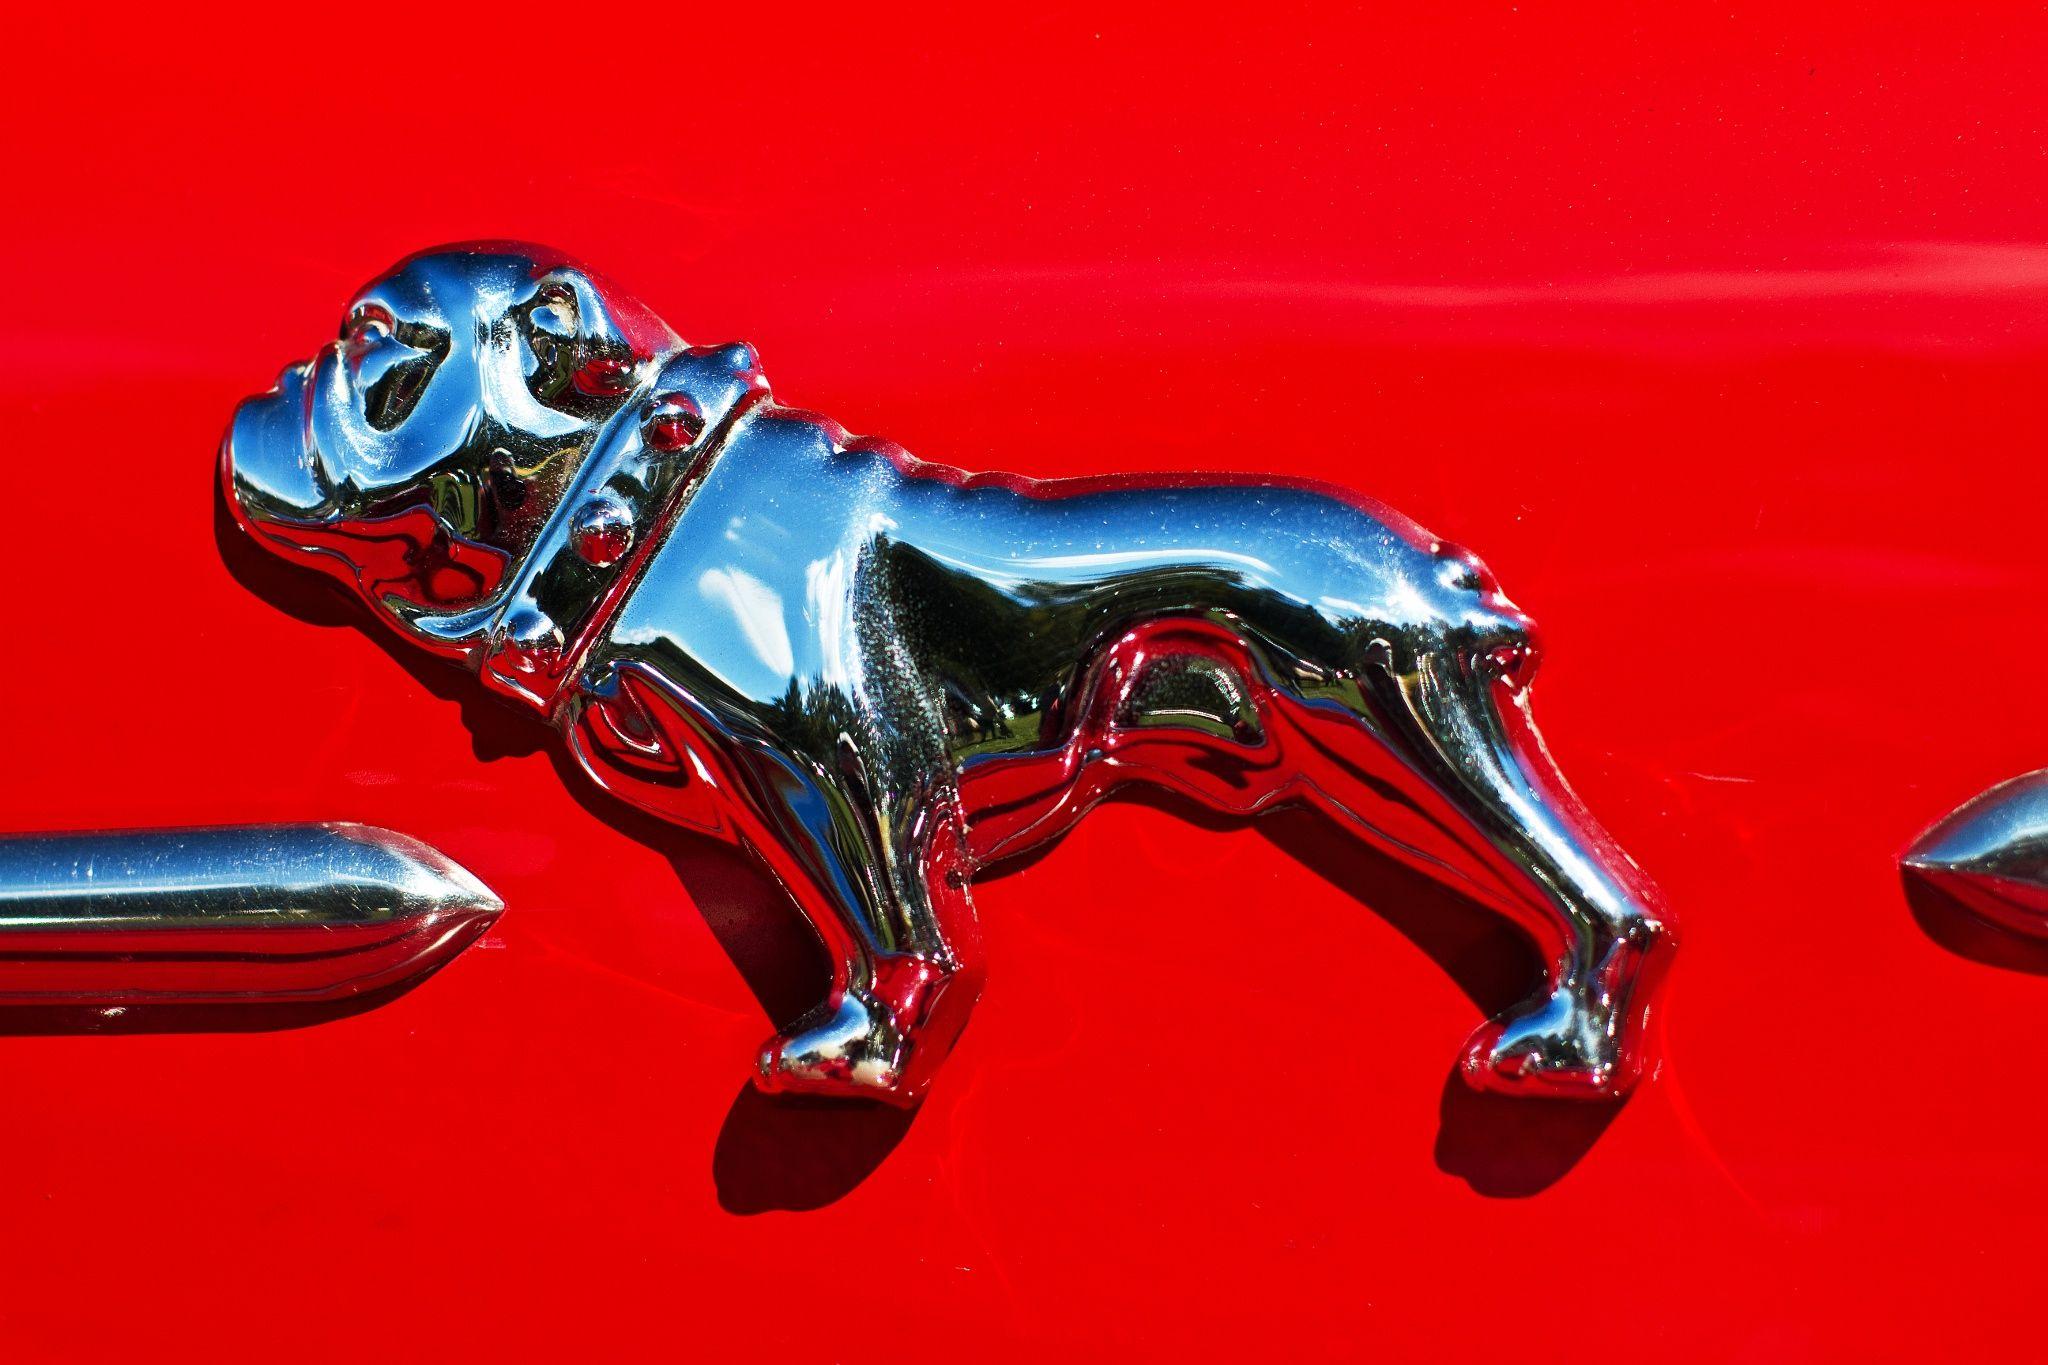 Pin by Kristine on Auto emblems & hood ornaments Mack